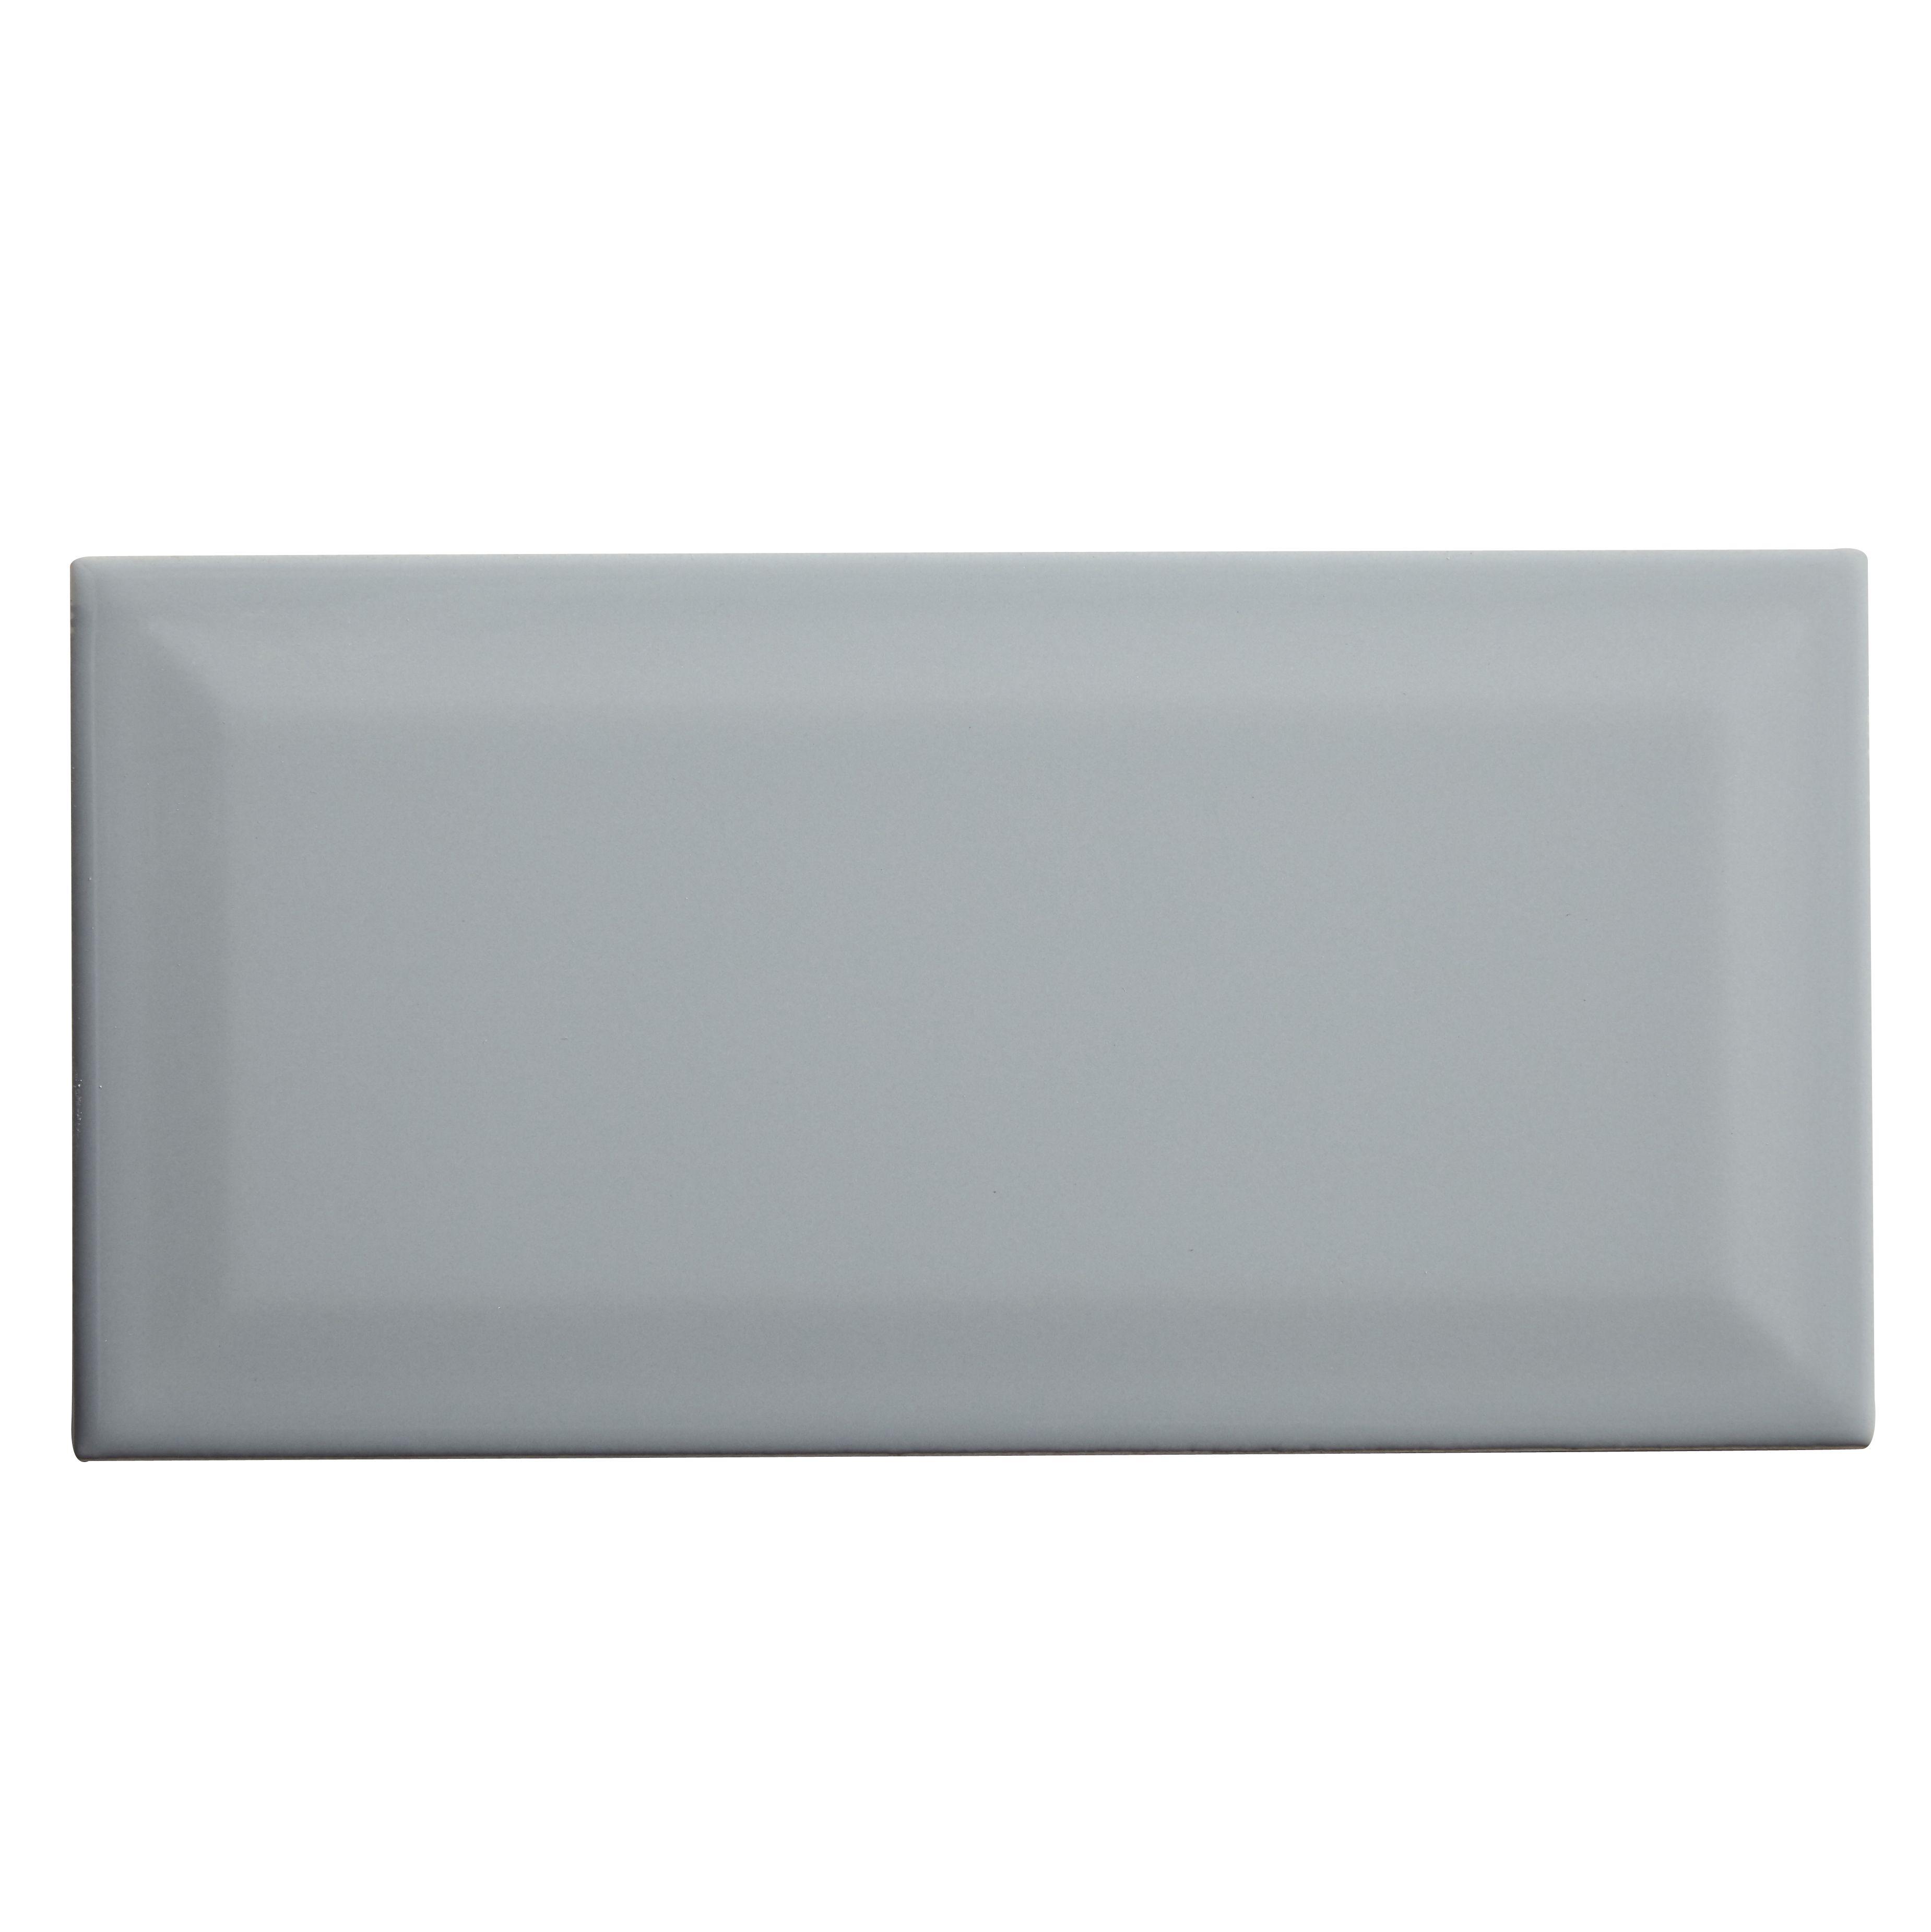 Trentie Grey Gloss Ceramic Wall Tile L 200mm W 100mm